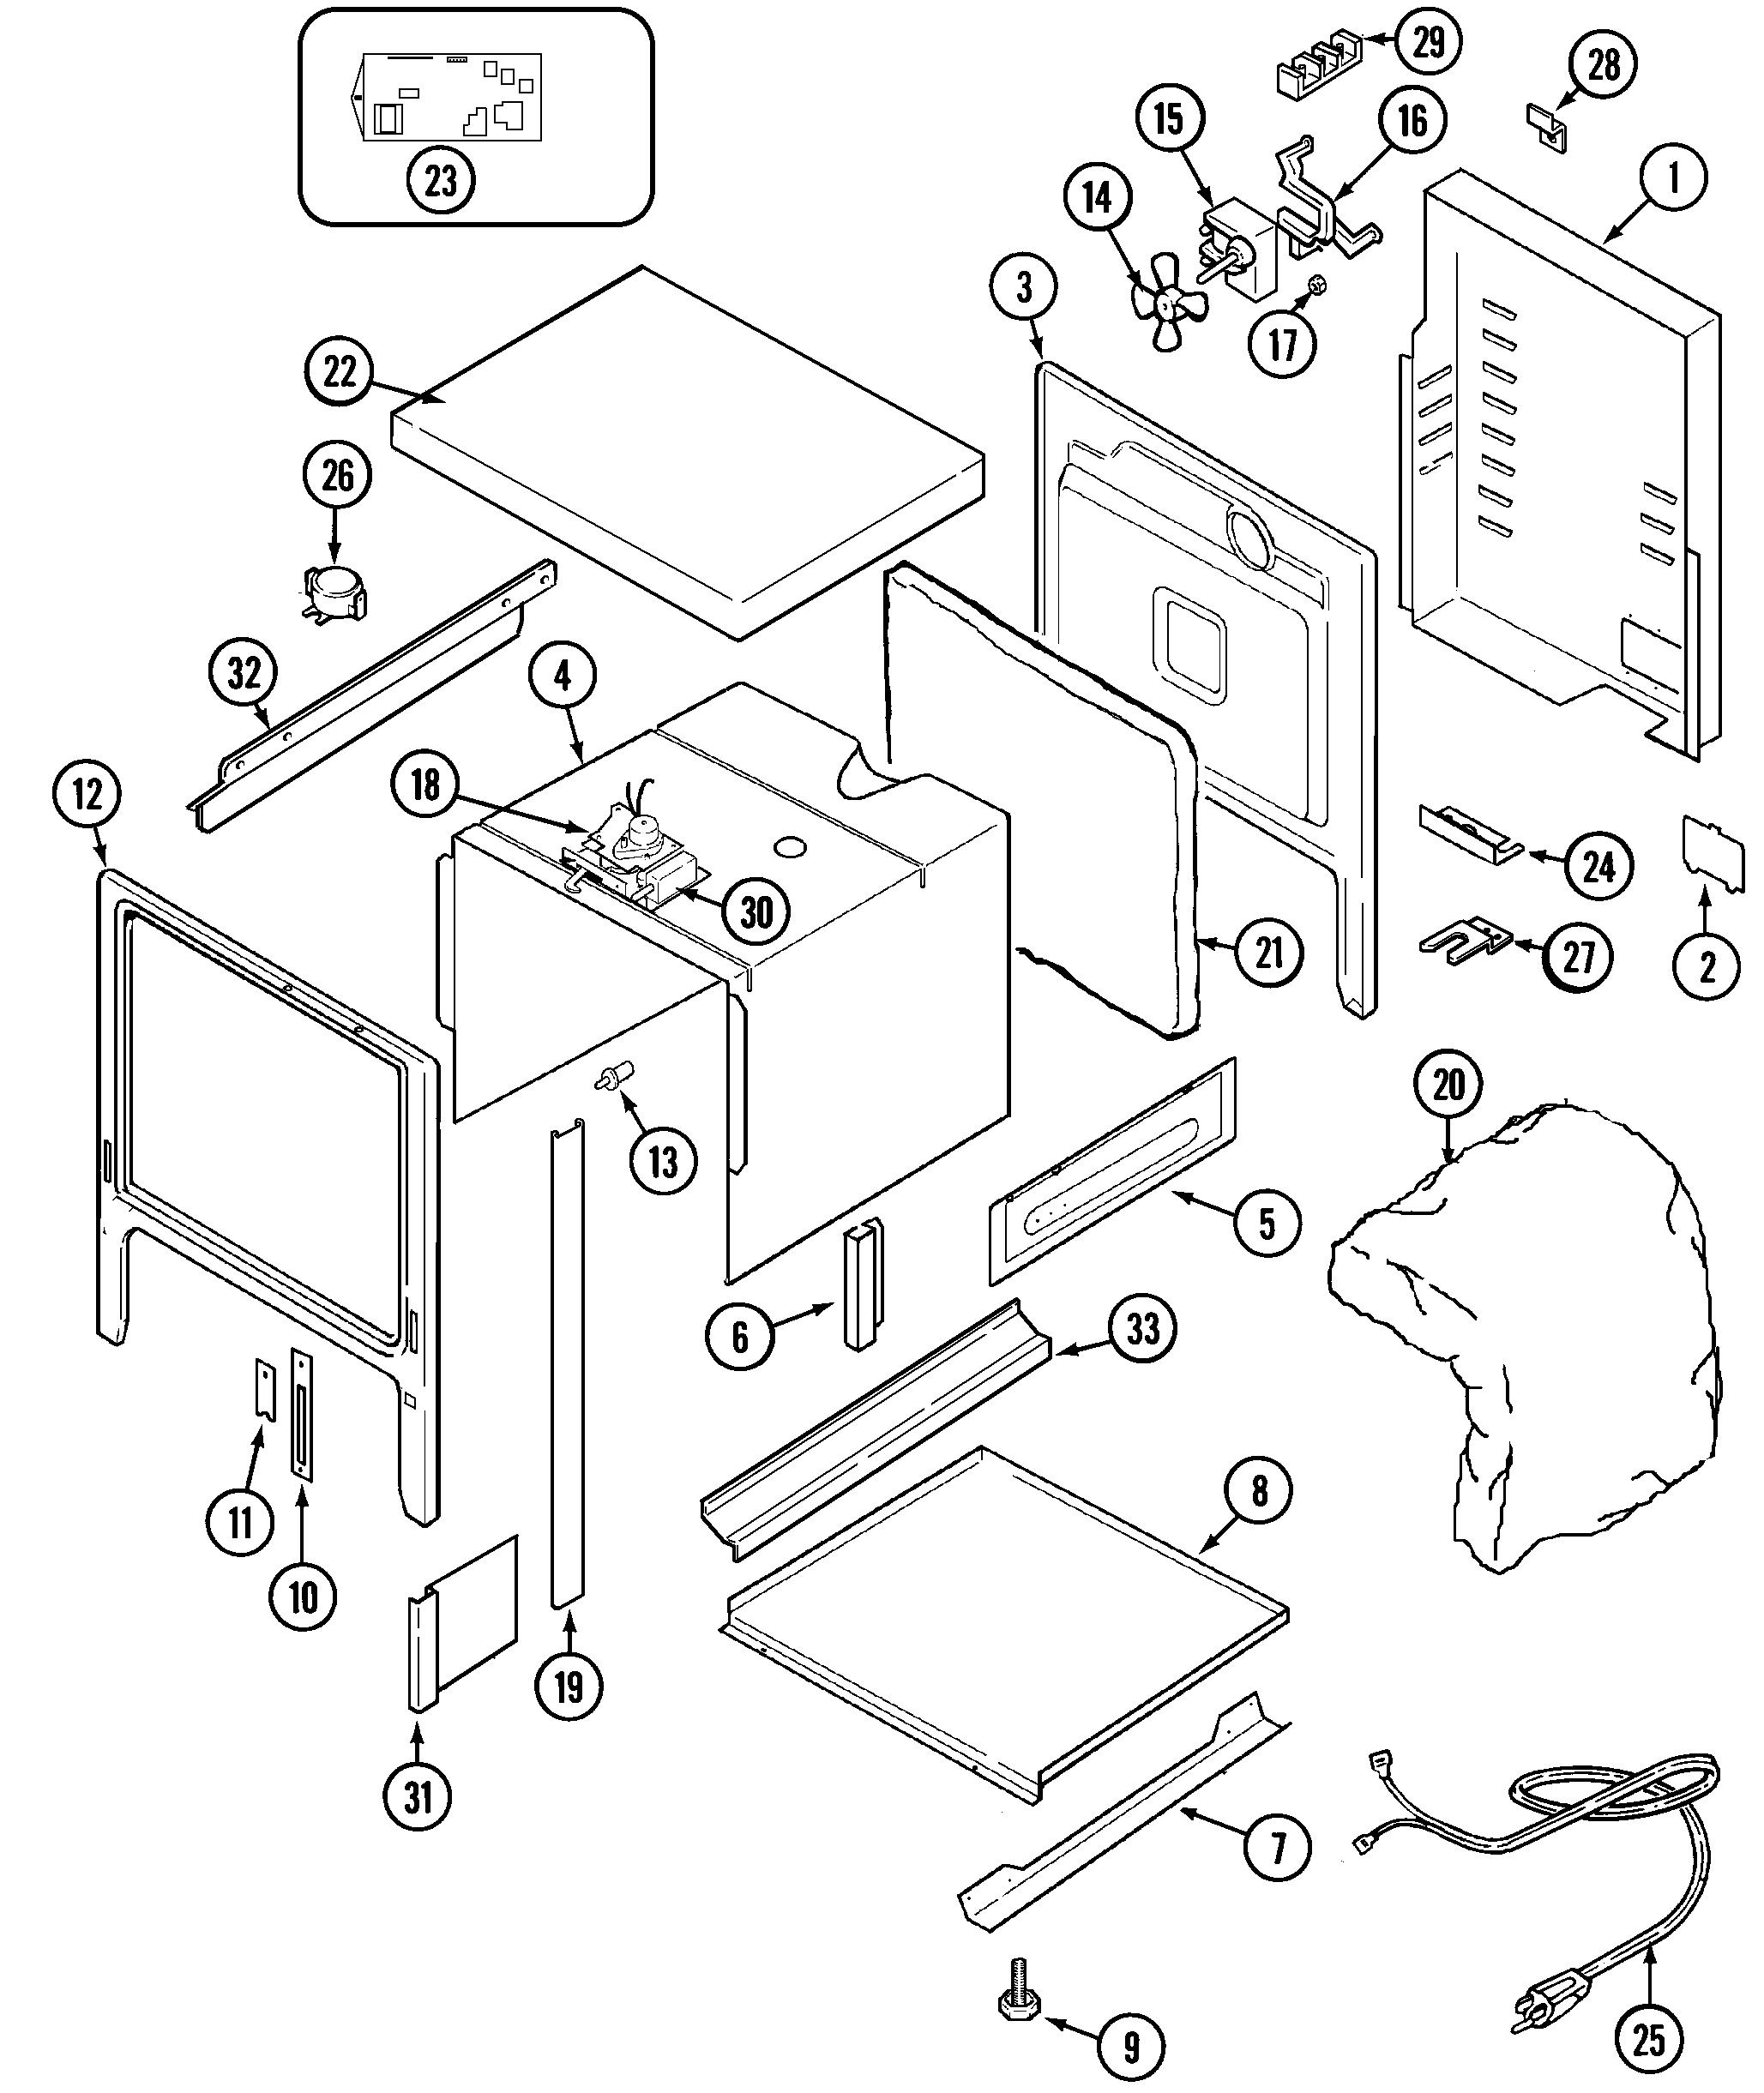 K Kicker Amp Wiring Diagram on